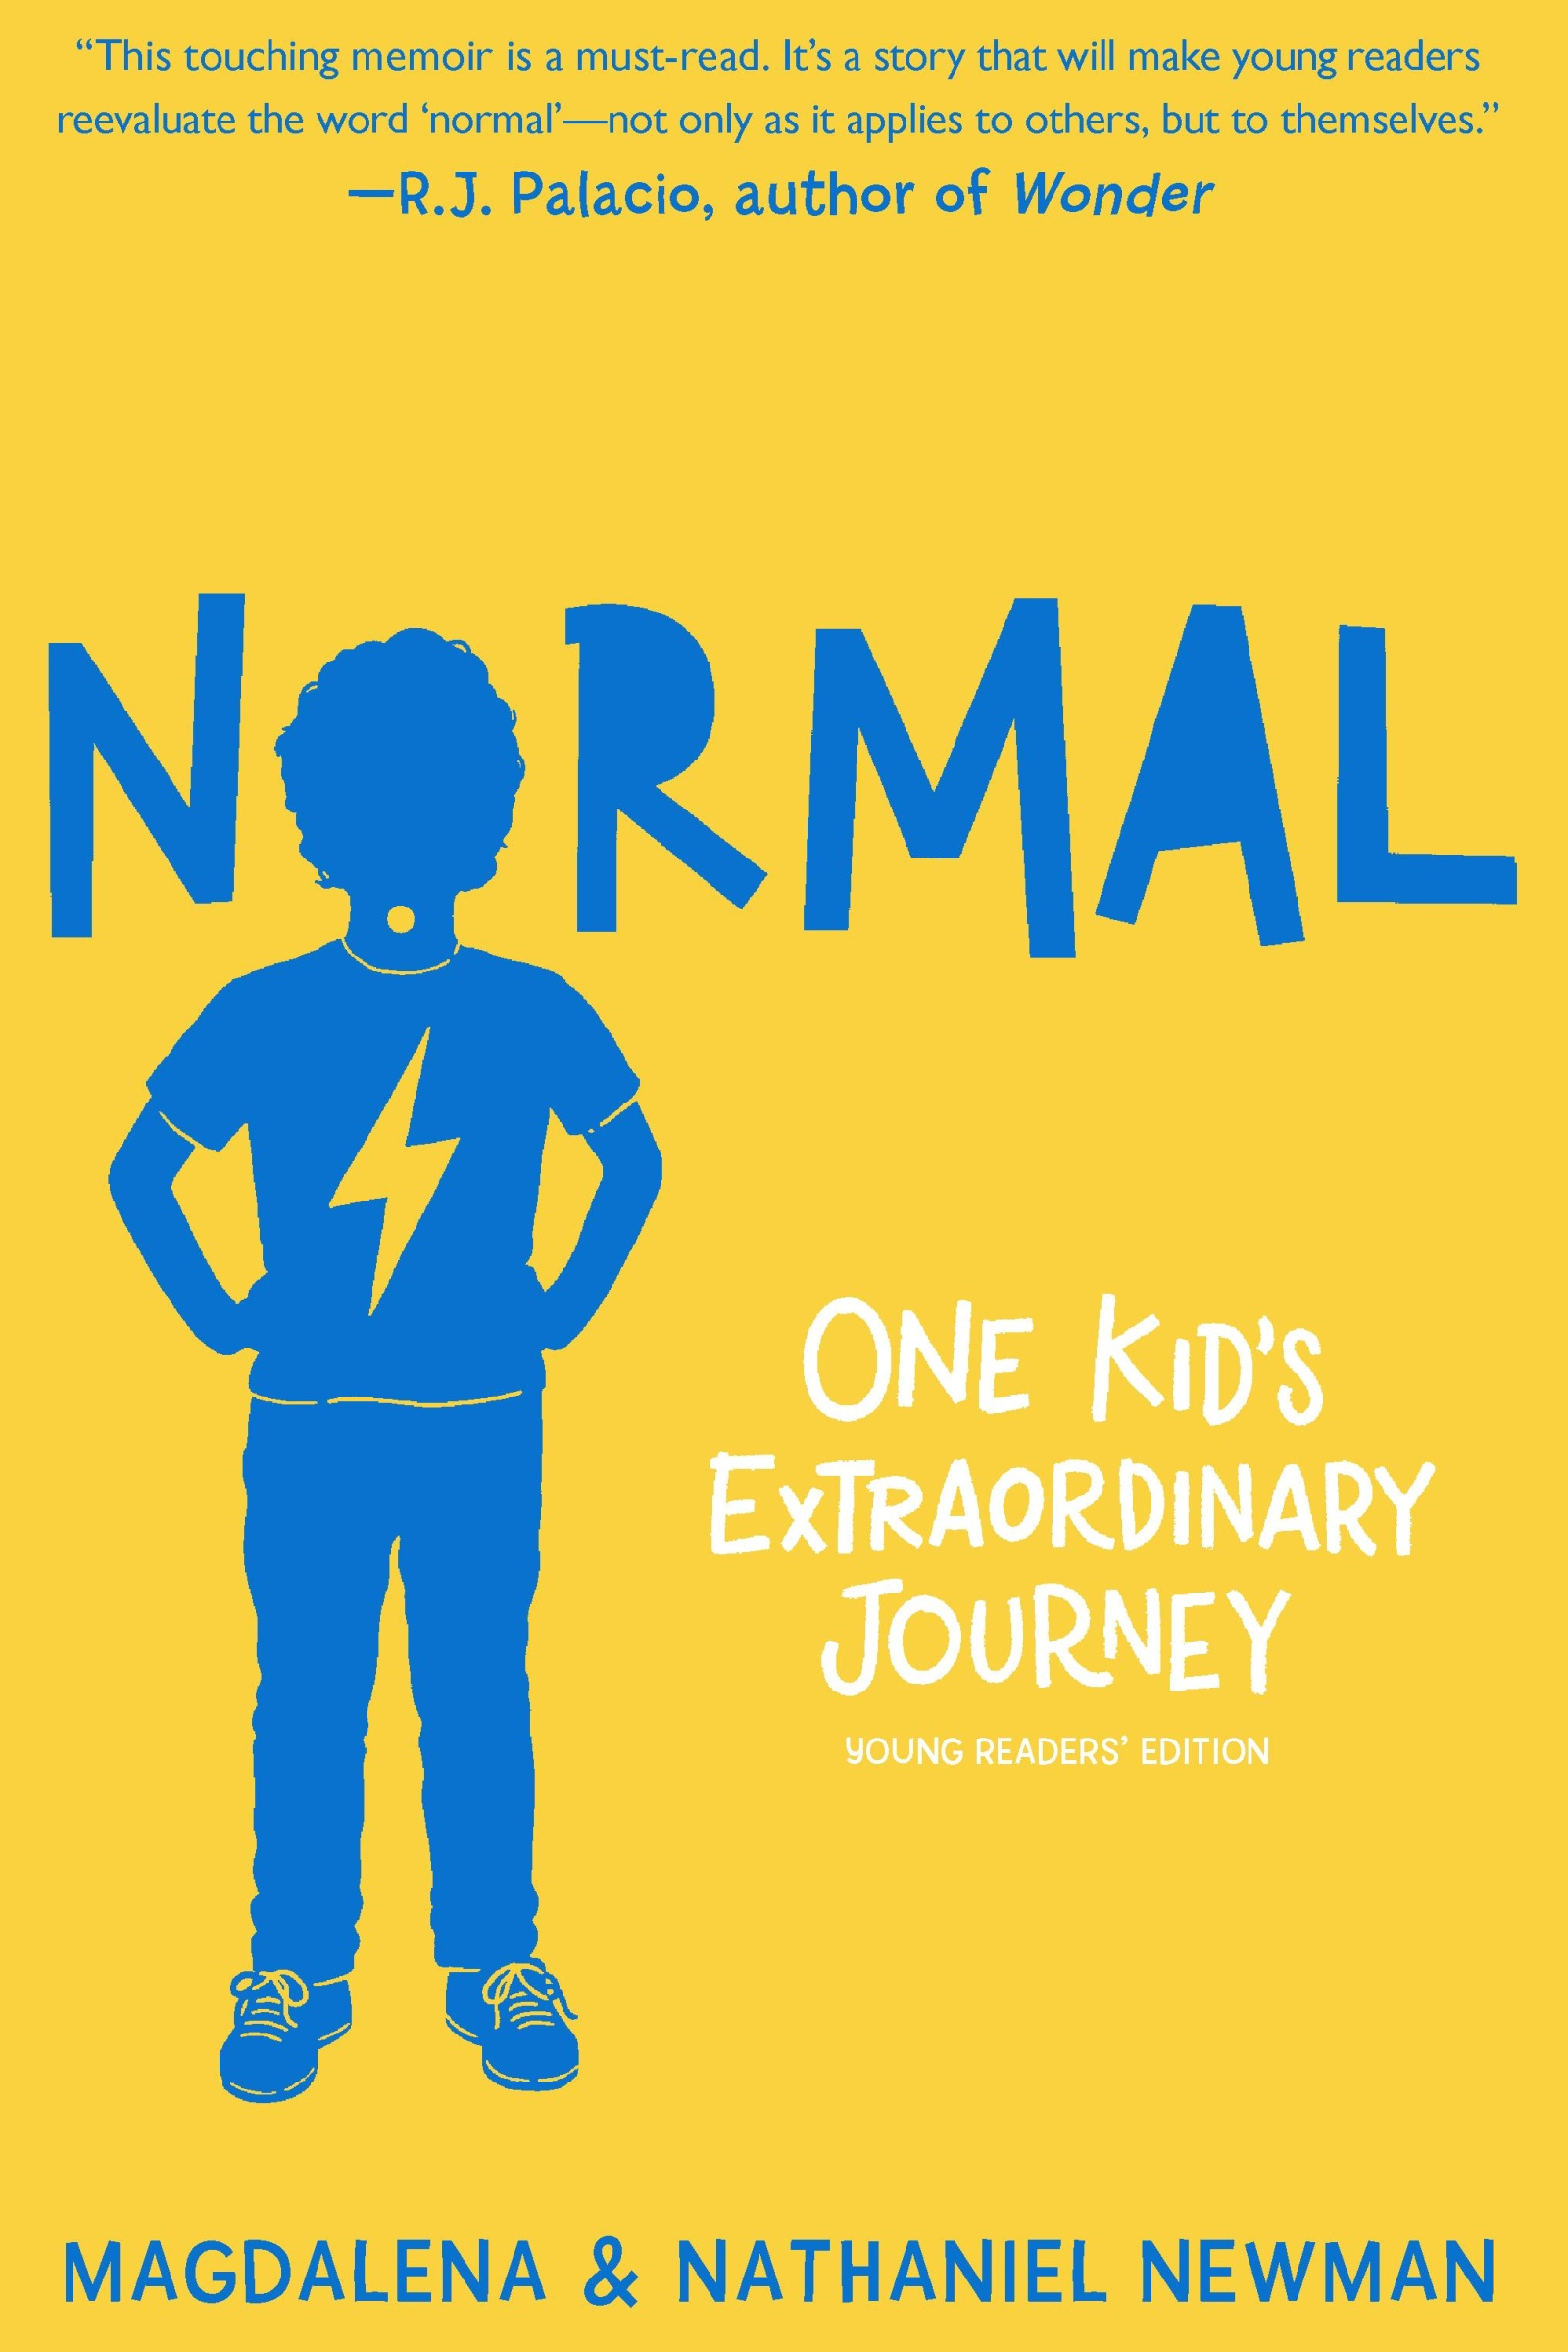 Normal One Kid's Extraordinary Journey